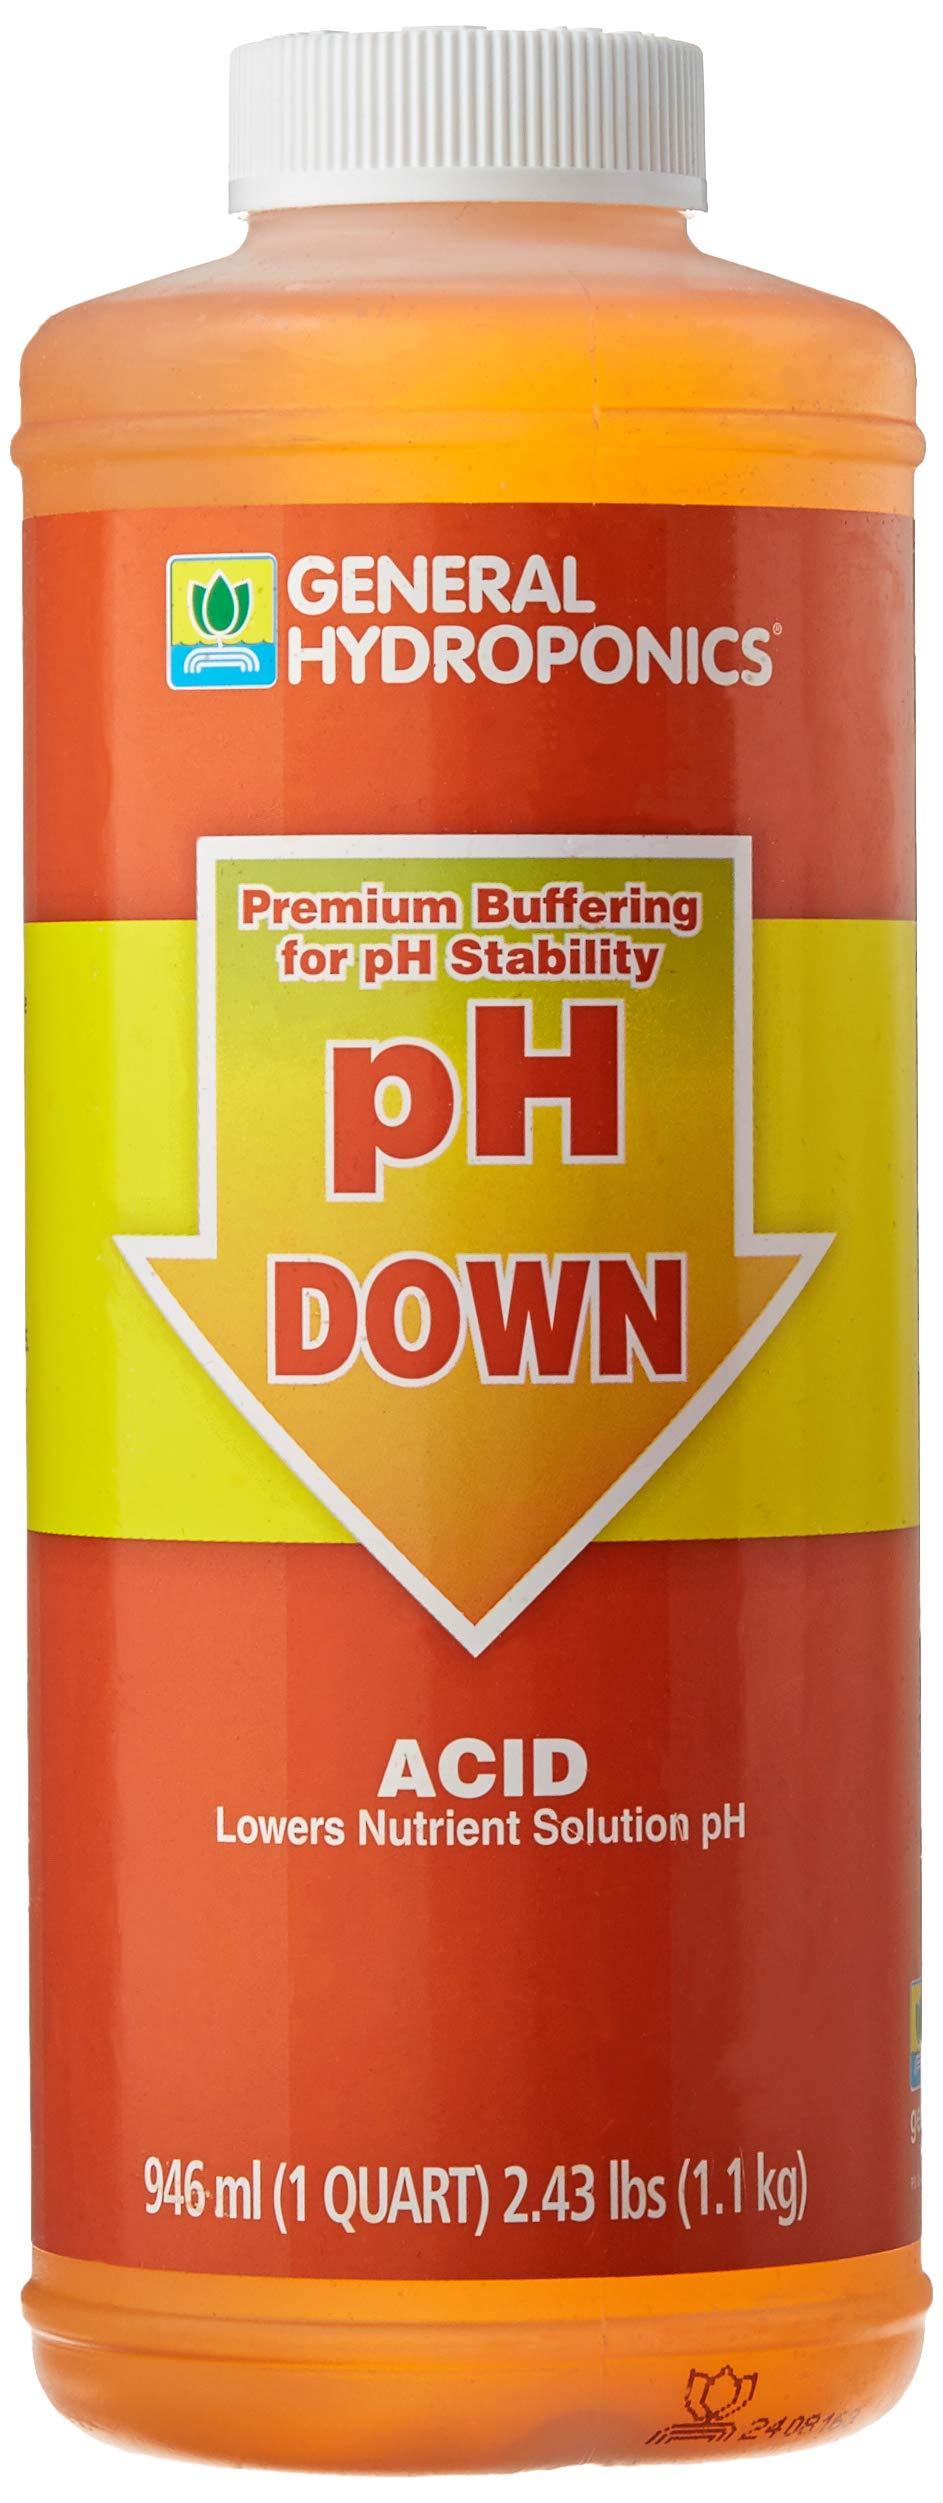 General Hydroponics pH Down Liquid Premium Buffering For pH Stability, Quart                Clorox Pool&Spa 12105CLX pH Down, 5 lb                Leisure Time 22338A Spa Down Balancer for Hot Tubs, 2.5 lbs                General Hydroponics pH Control Kit